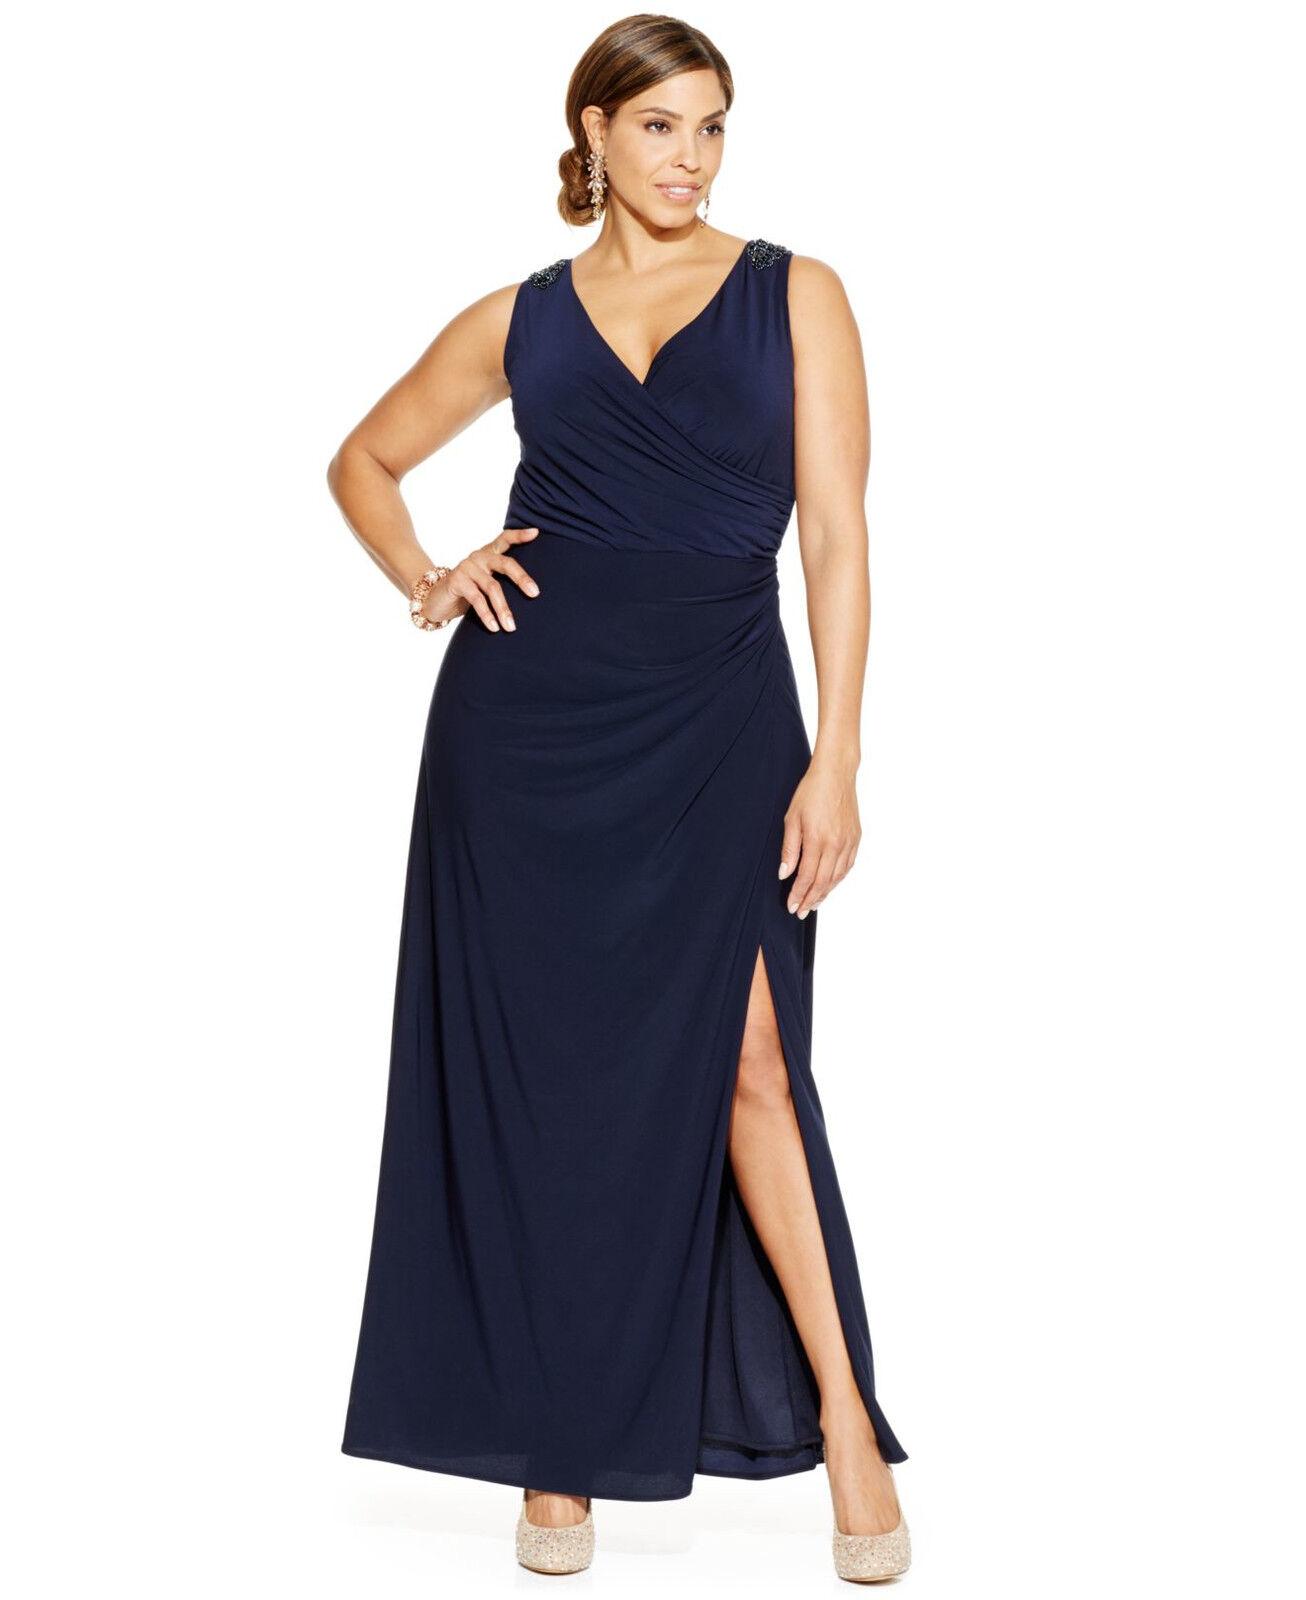 Patra Womens Dress 16W bluee Side Slit Embellished Sleeveless Gown Navy Plus Size